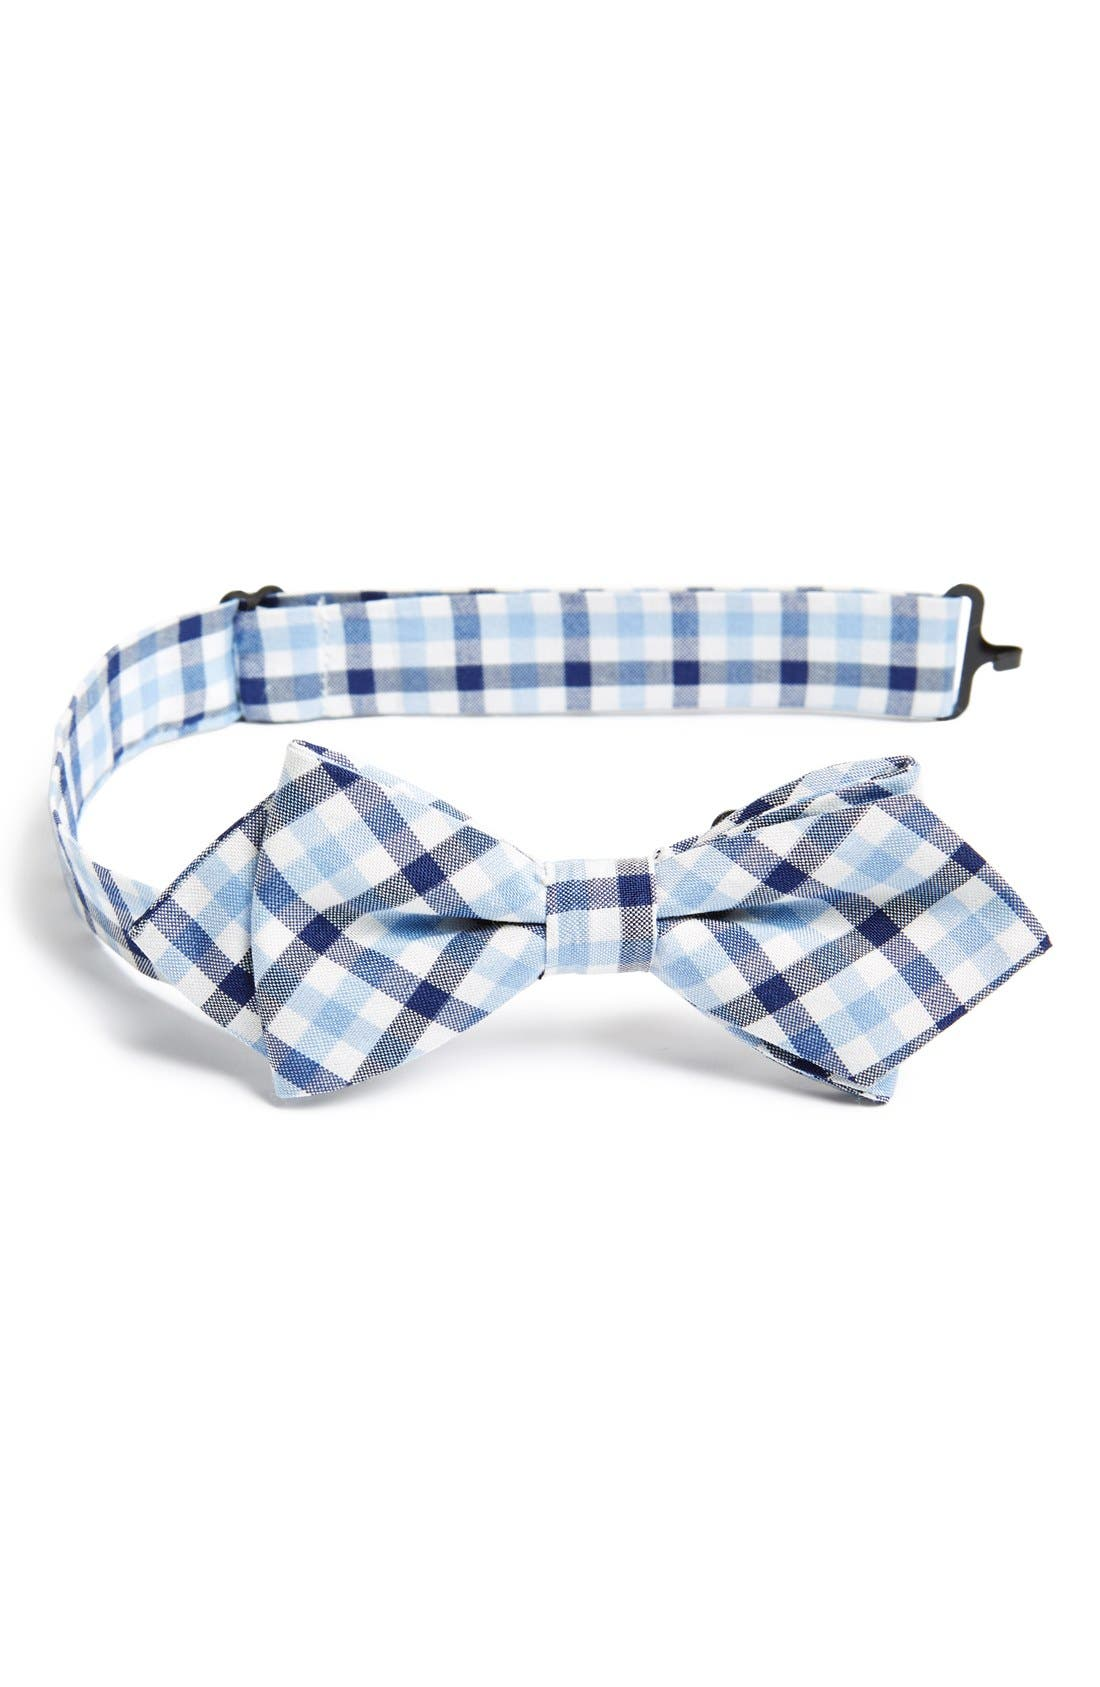 Alternate Image 1 Selected - Nordstrom Cotton Blend Bow Tie (Big Boys)